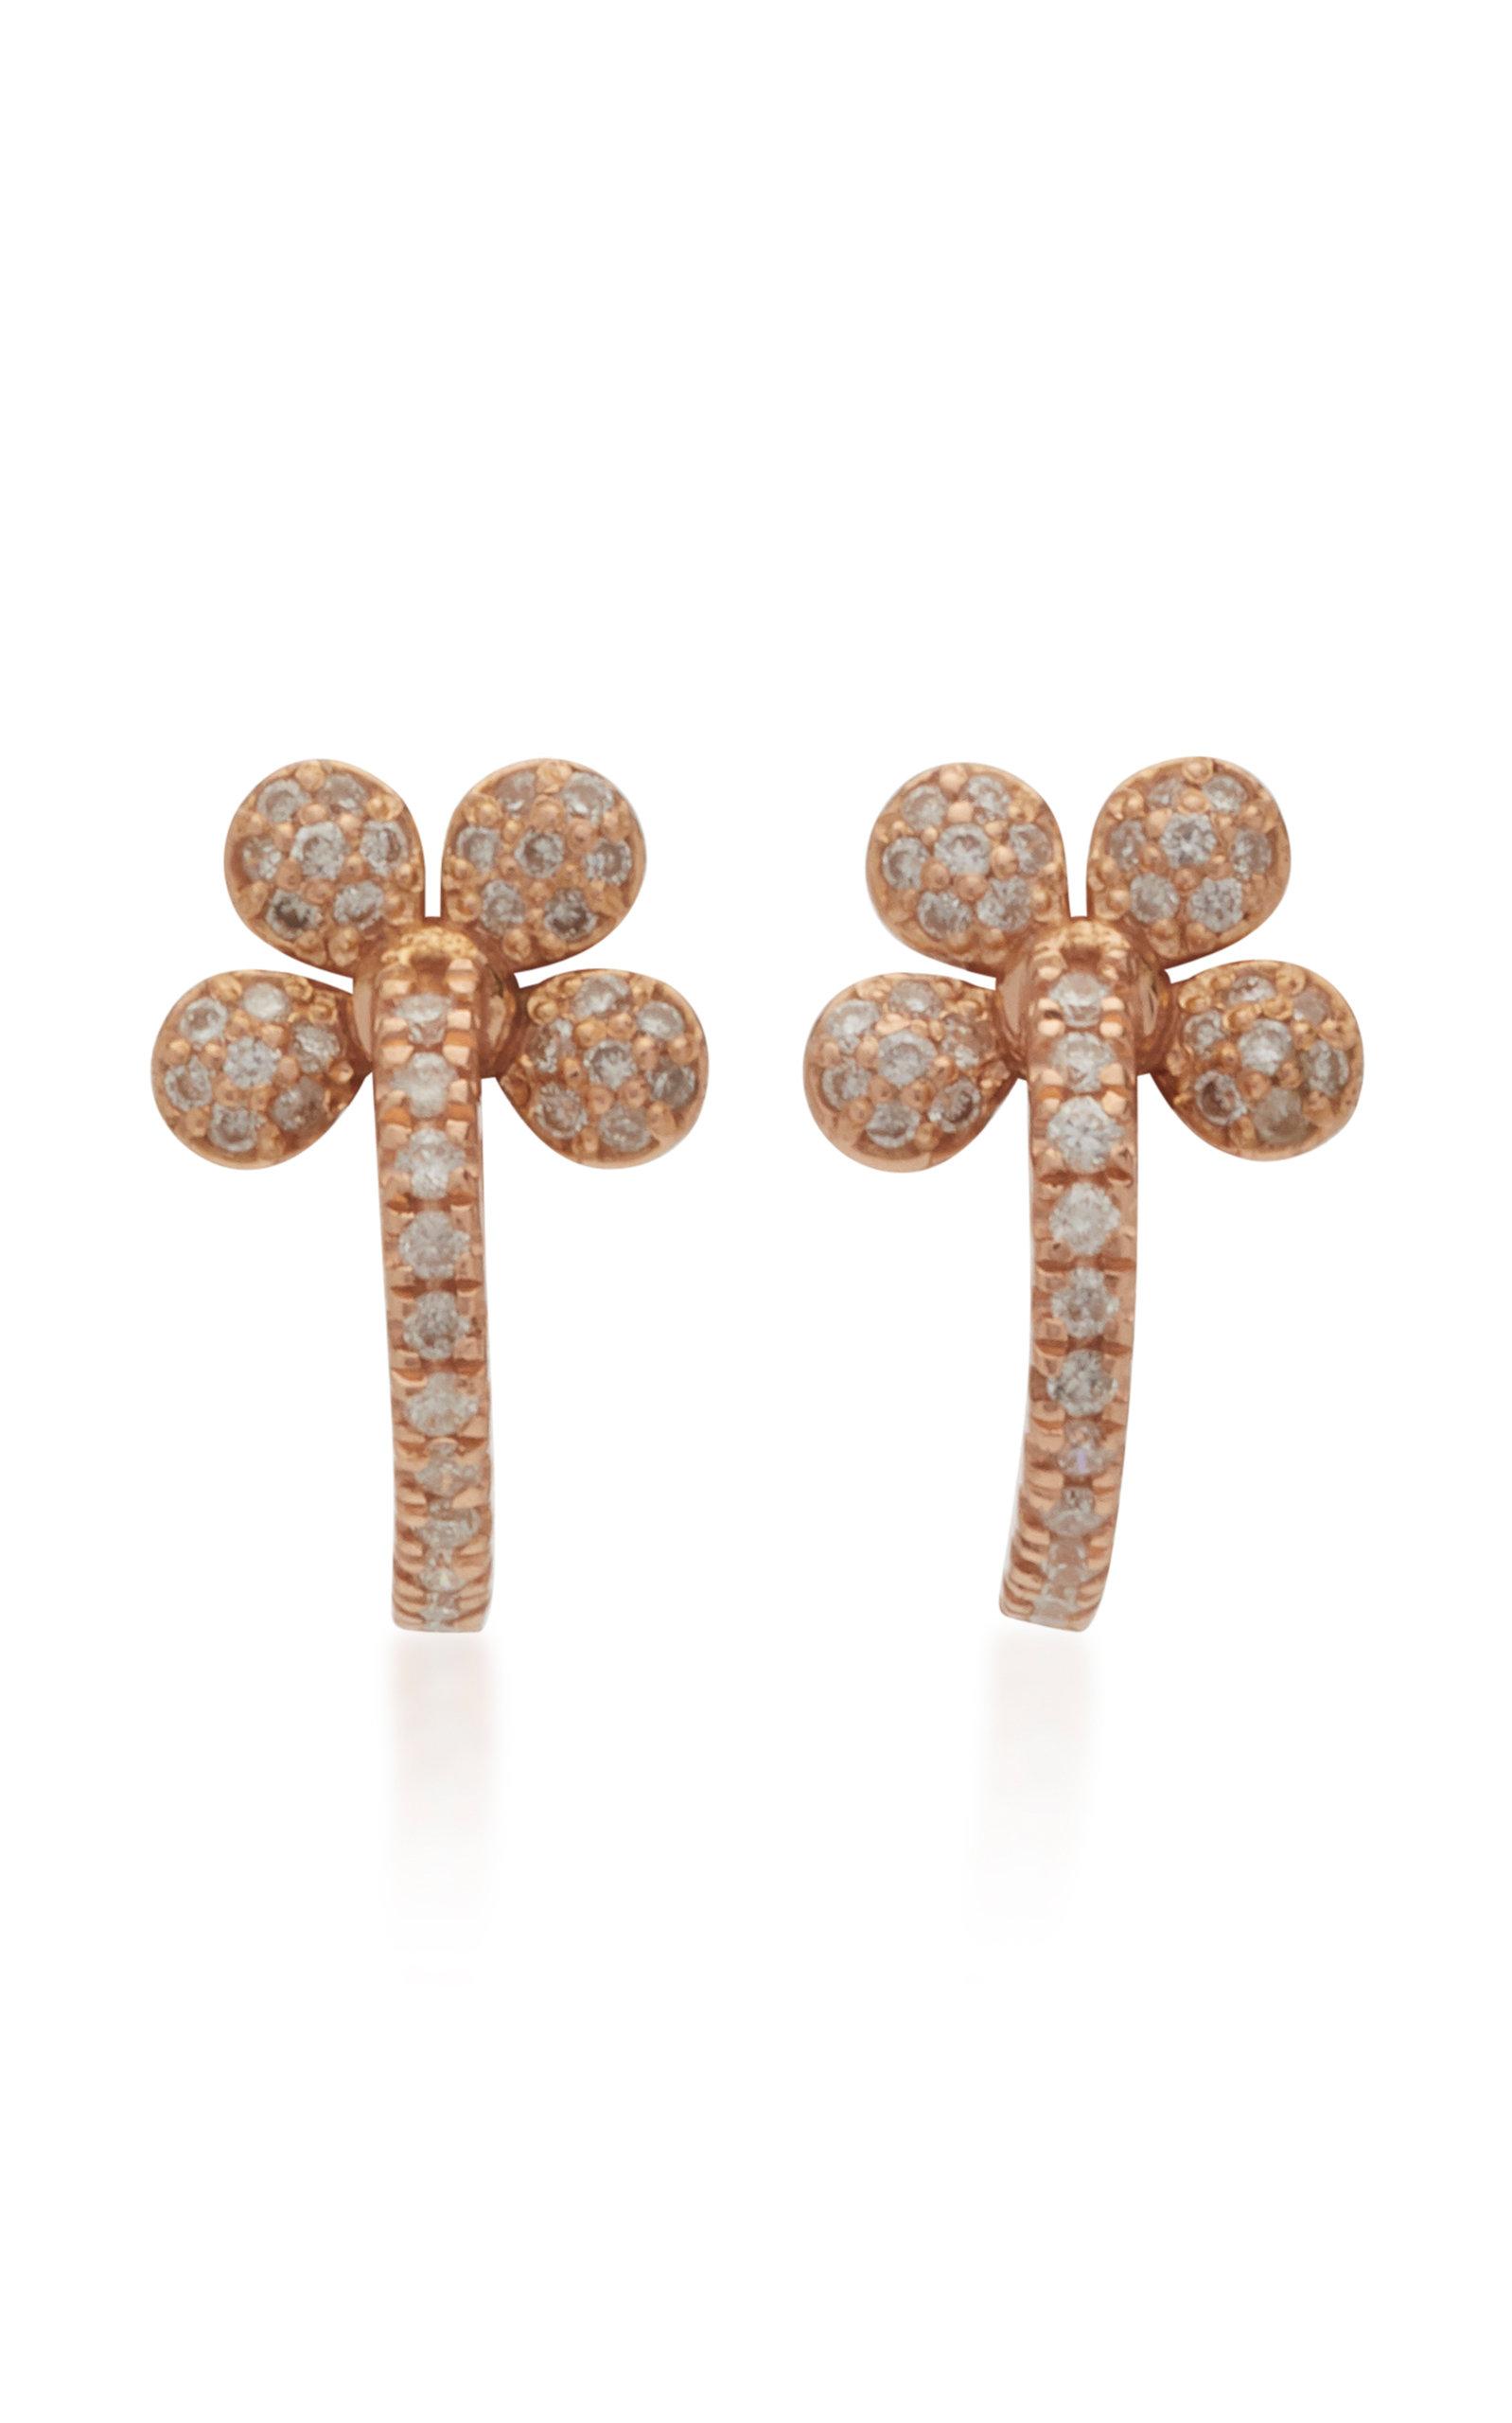 COLETTE JEWELRY Mini Petite Flower 18K Rose Gold And Diamond Hoop Earrings in Pink